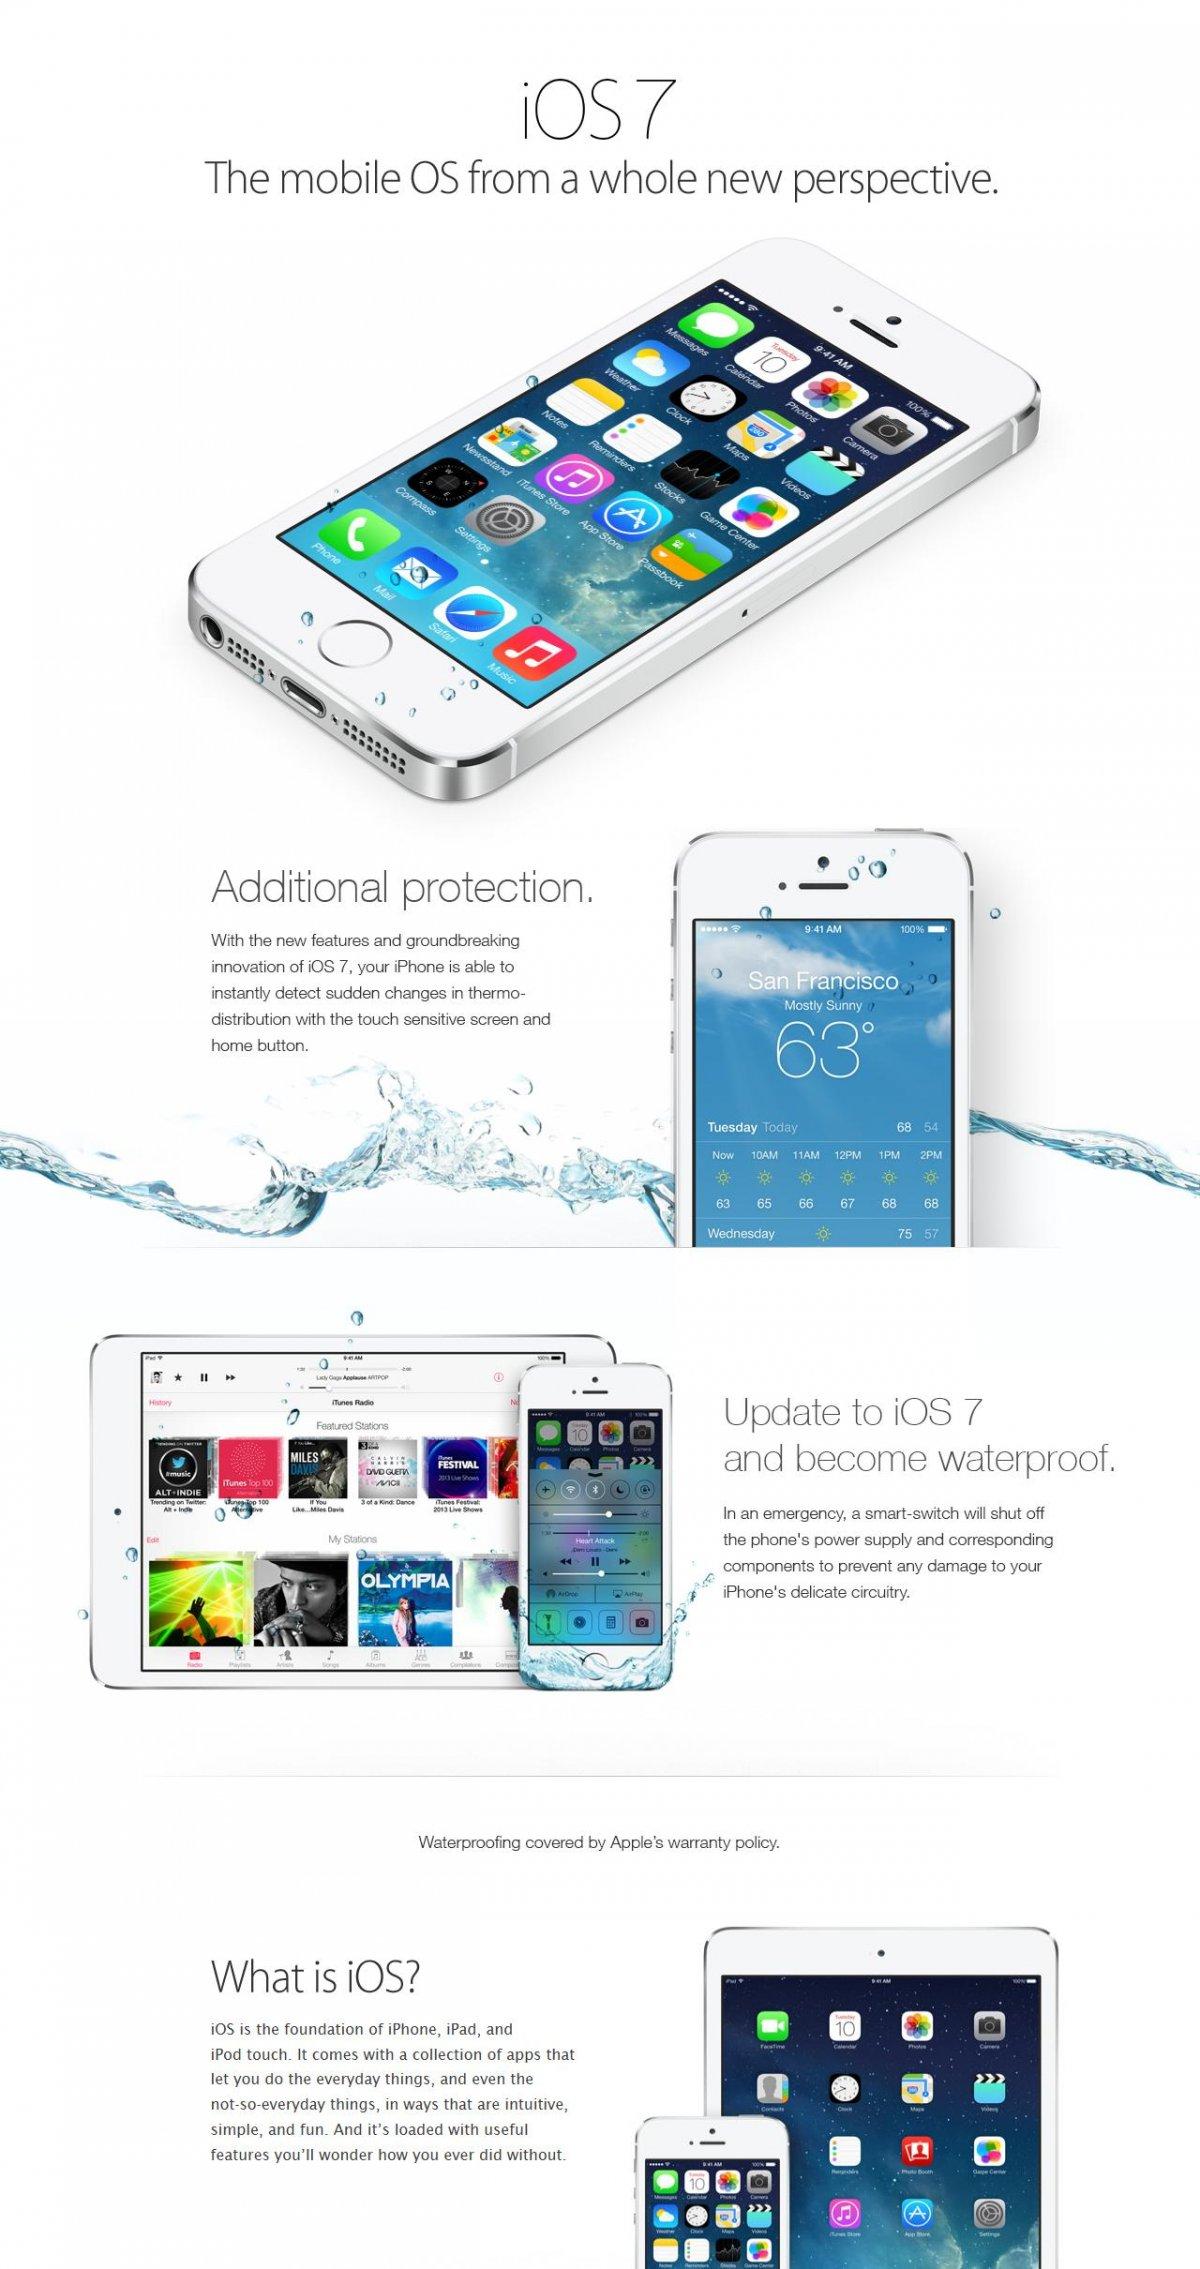 ios7-waterproofs-your-phone